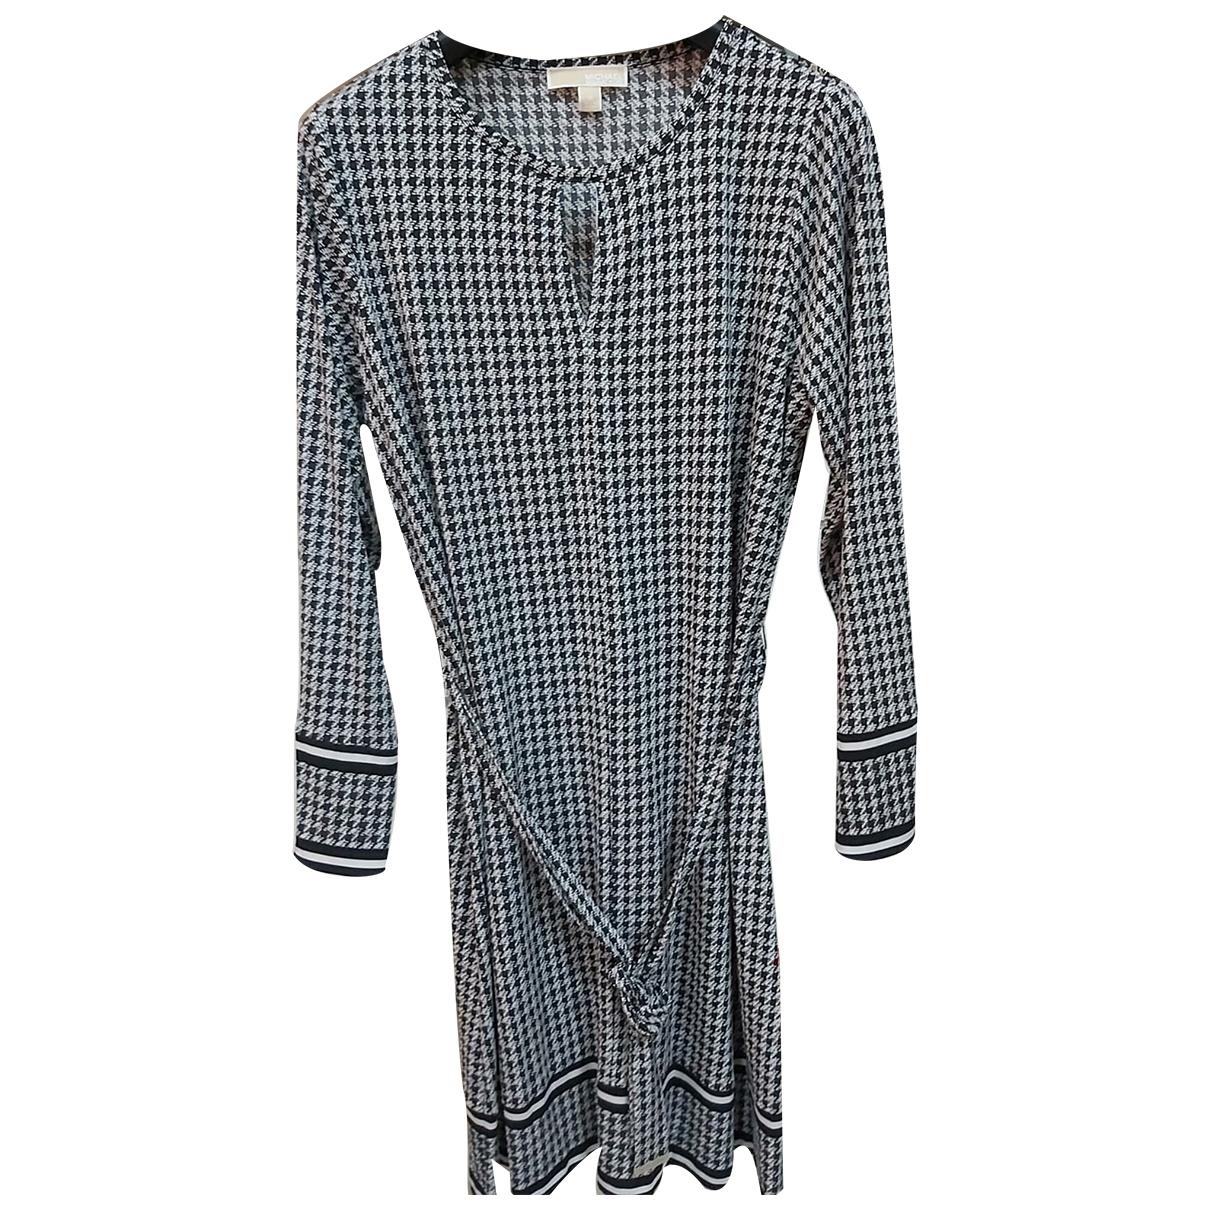 Michael Kors \N Black dress for Women XL International